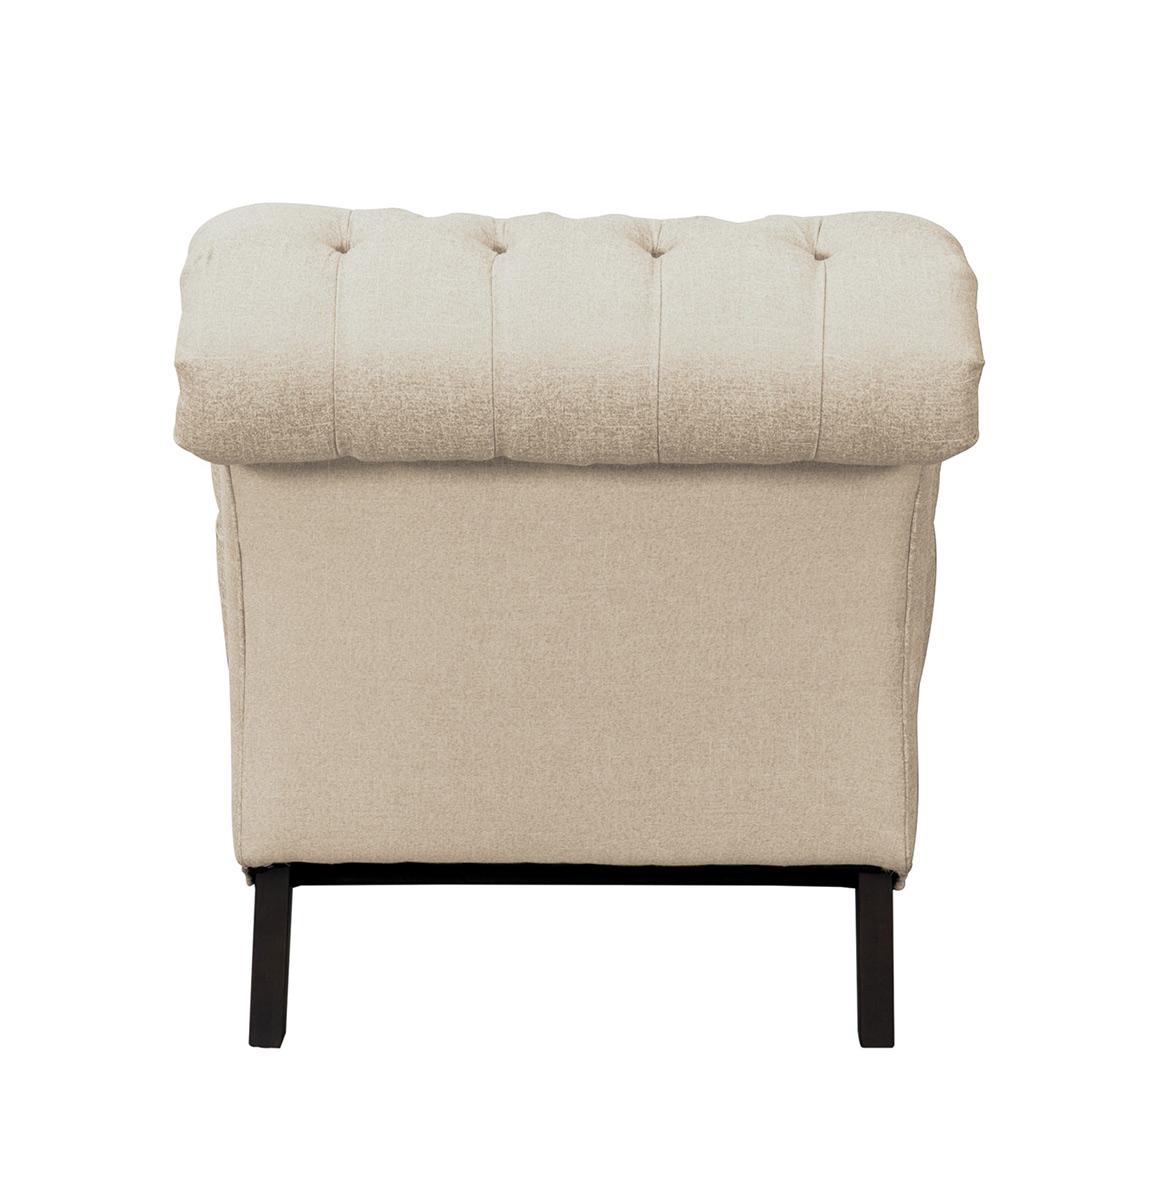 Homelegance Selles Chaise - Beige